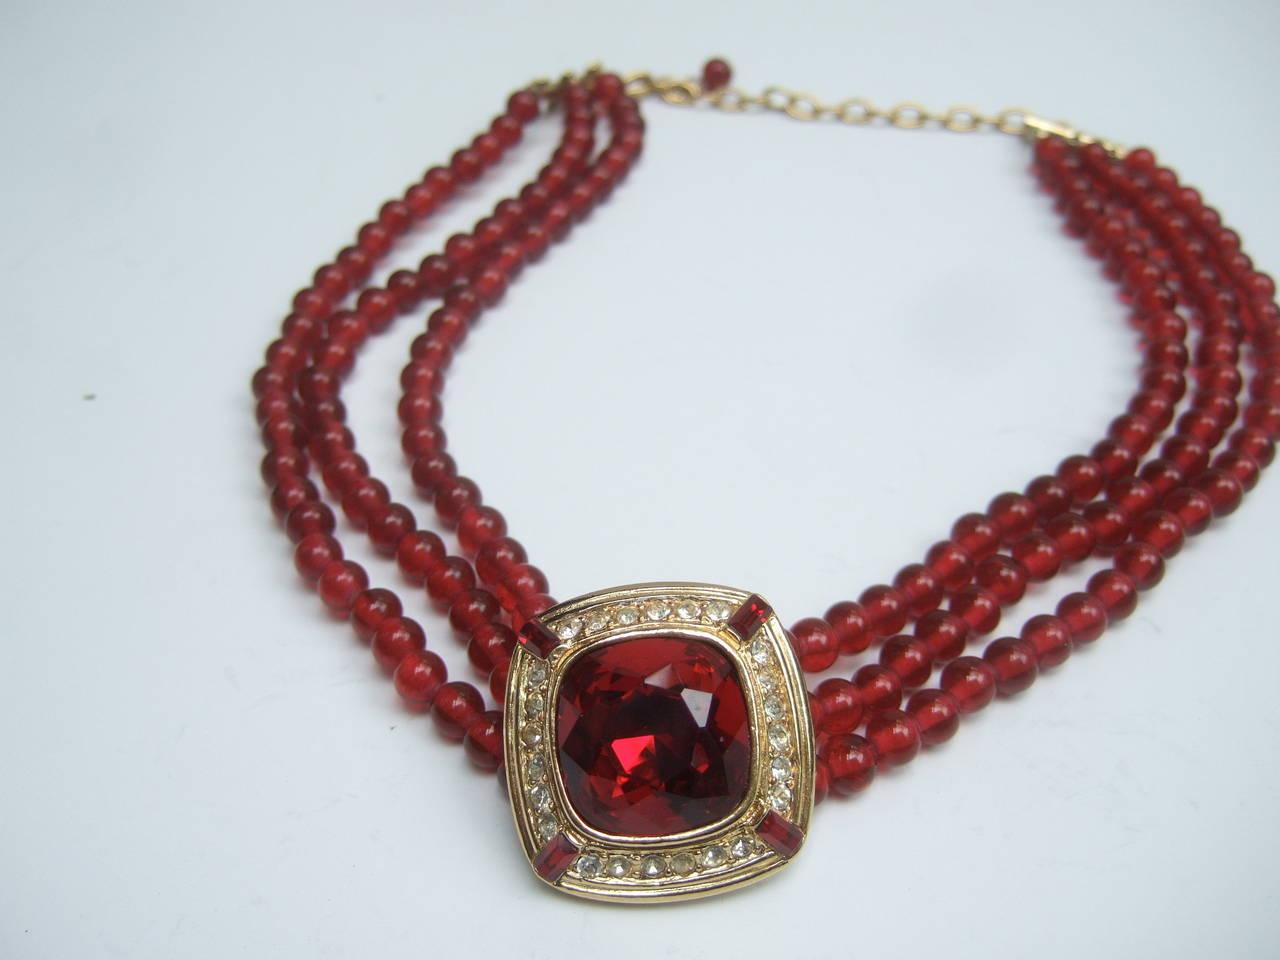 Trifari Elegant Ruby Glass Beaded Choker Necklace c 1980 5